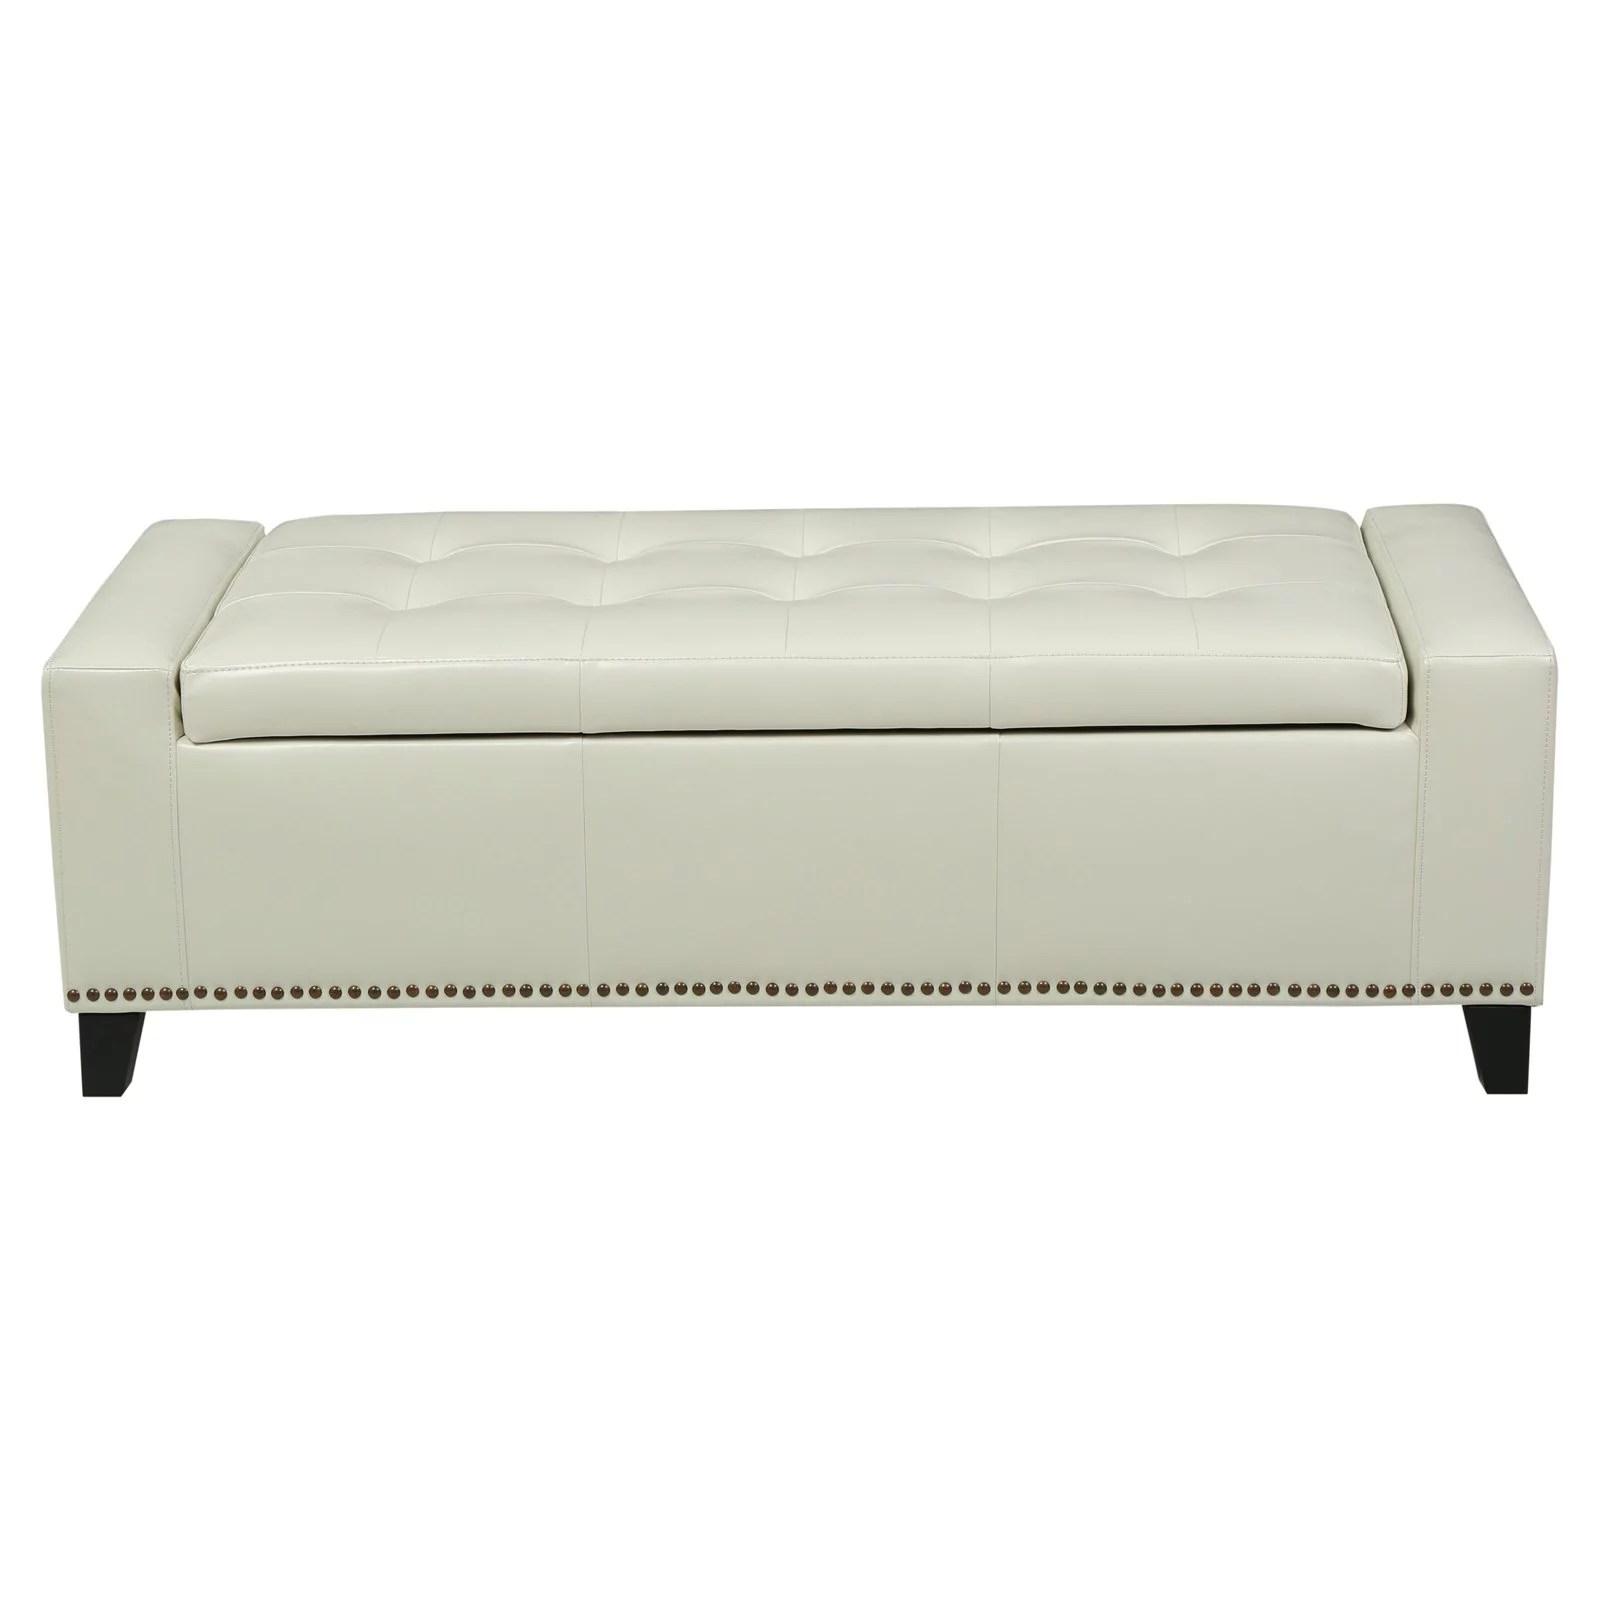 storage ottoman sound chair bar stool seat covers feather walmart com